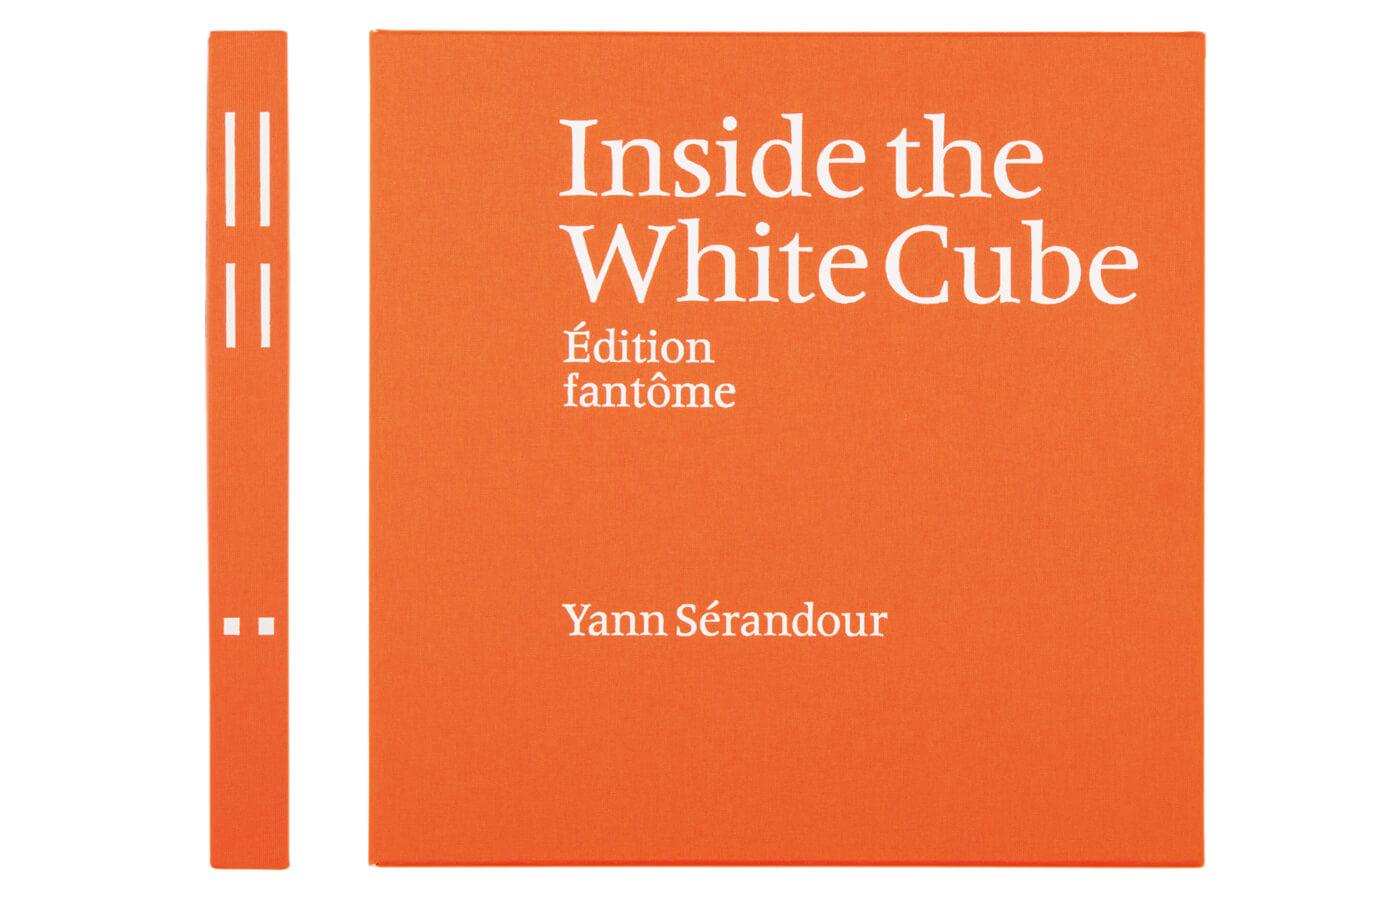 Inside the White Cube édition fantôme